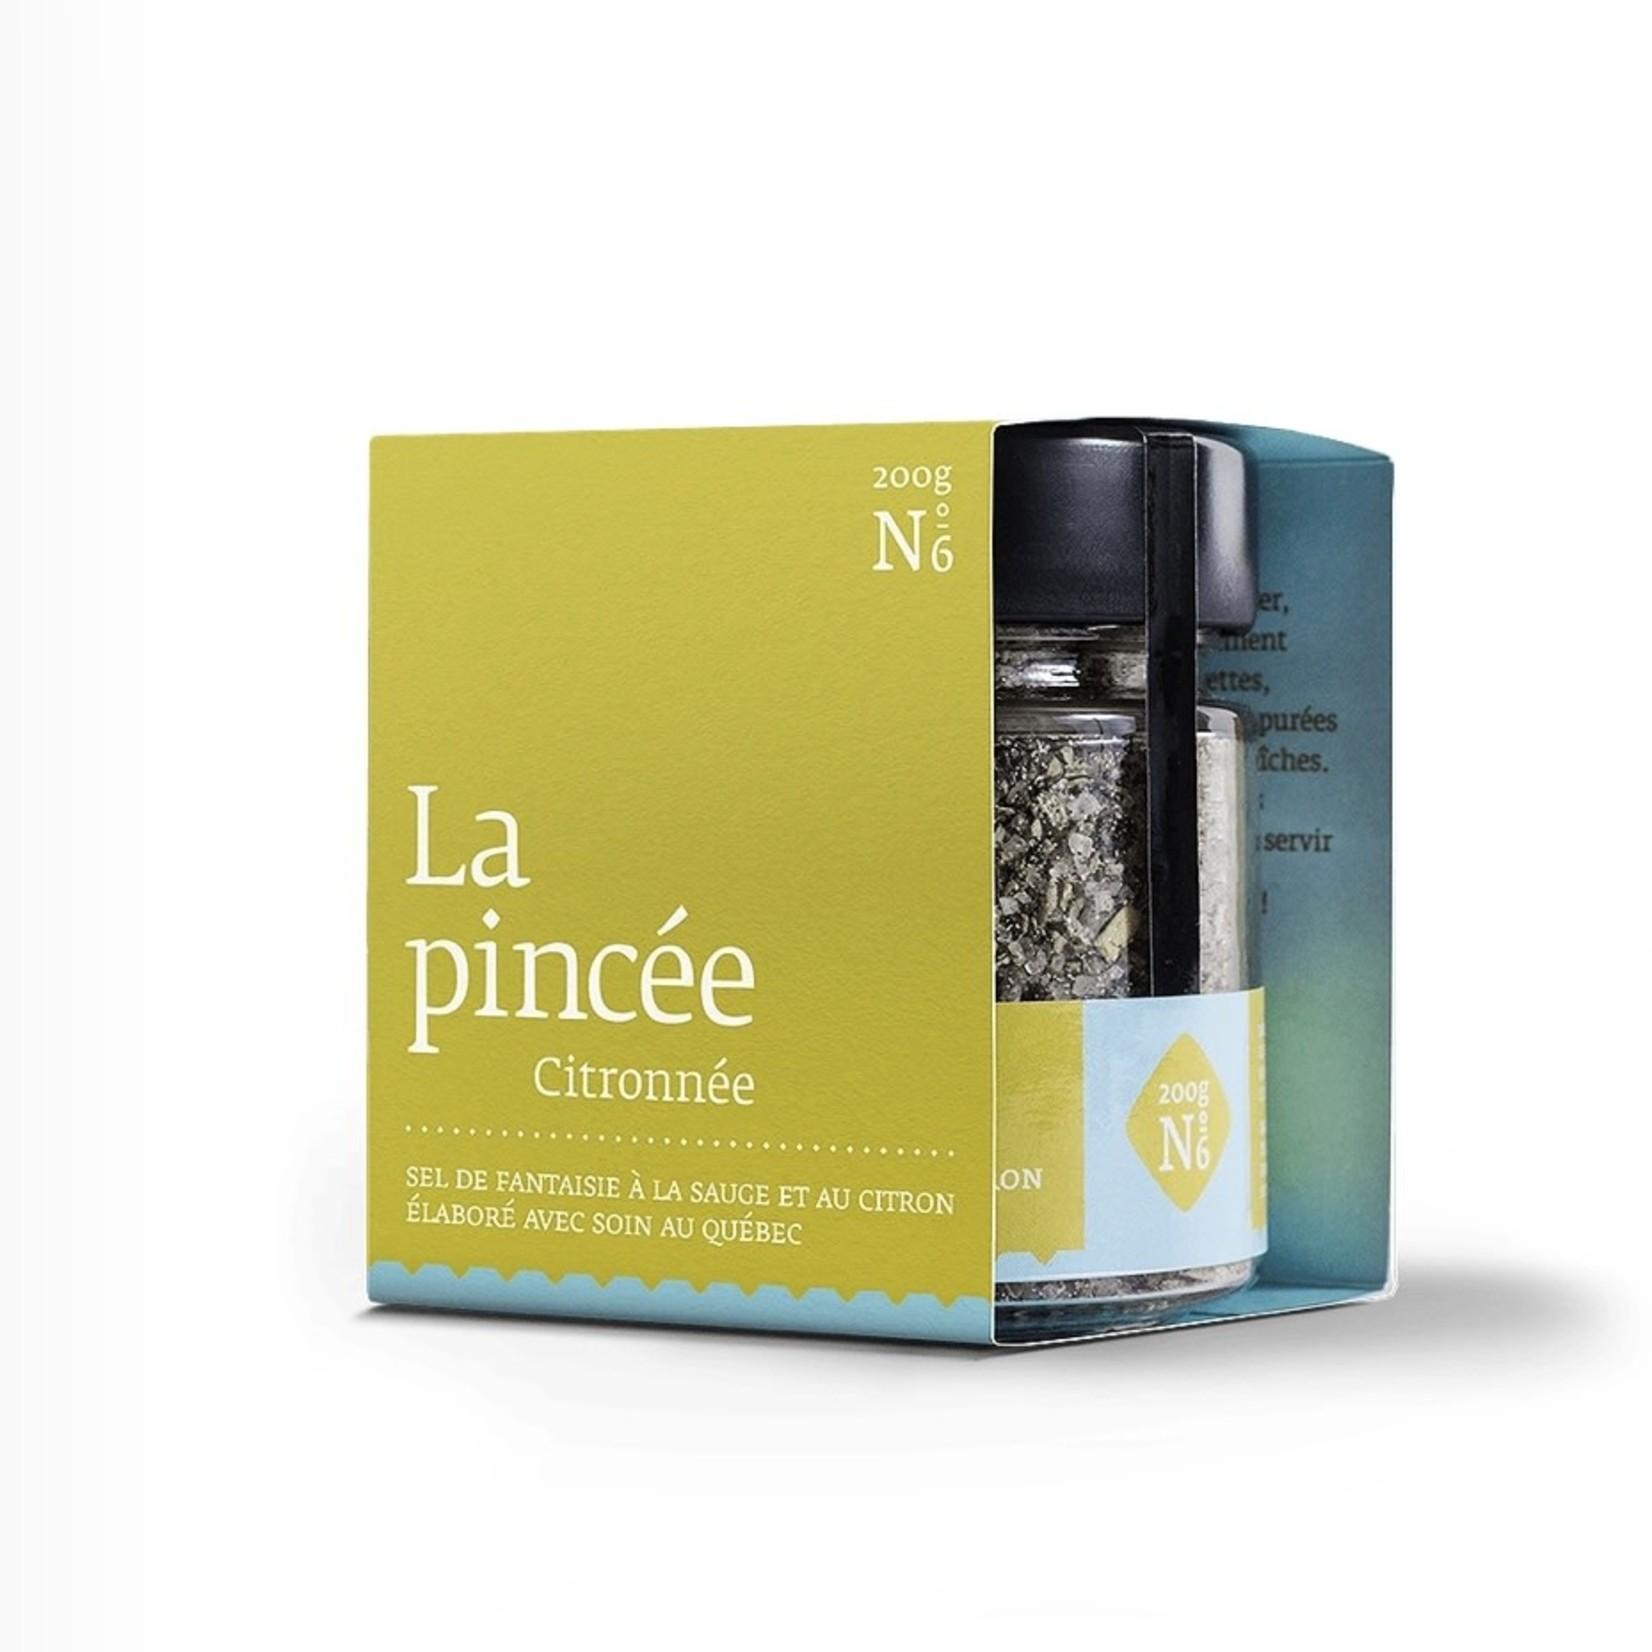 La pincée LA PINCÉE citronnée no6 (200g)